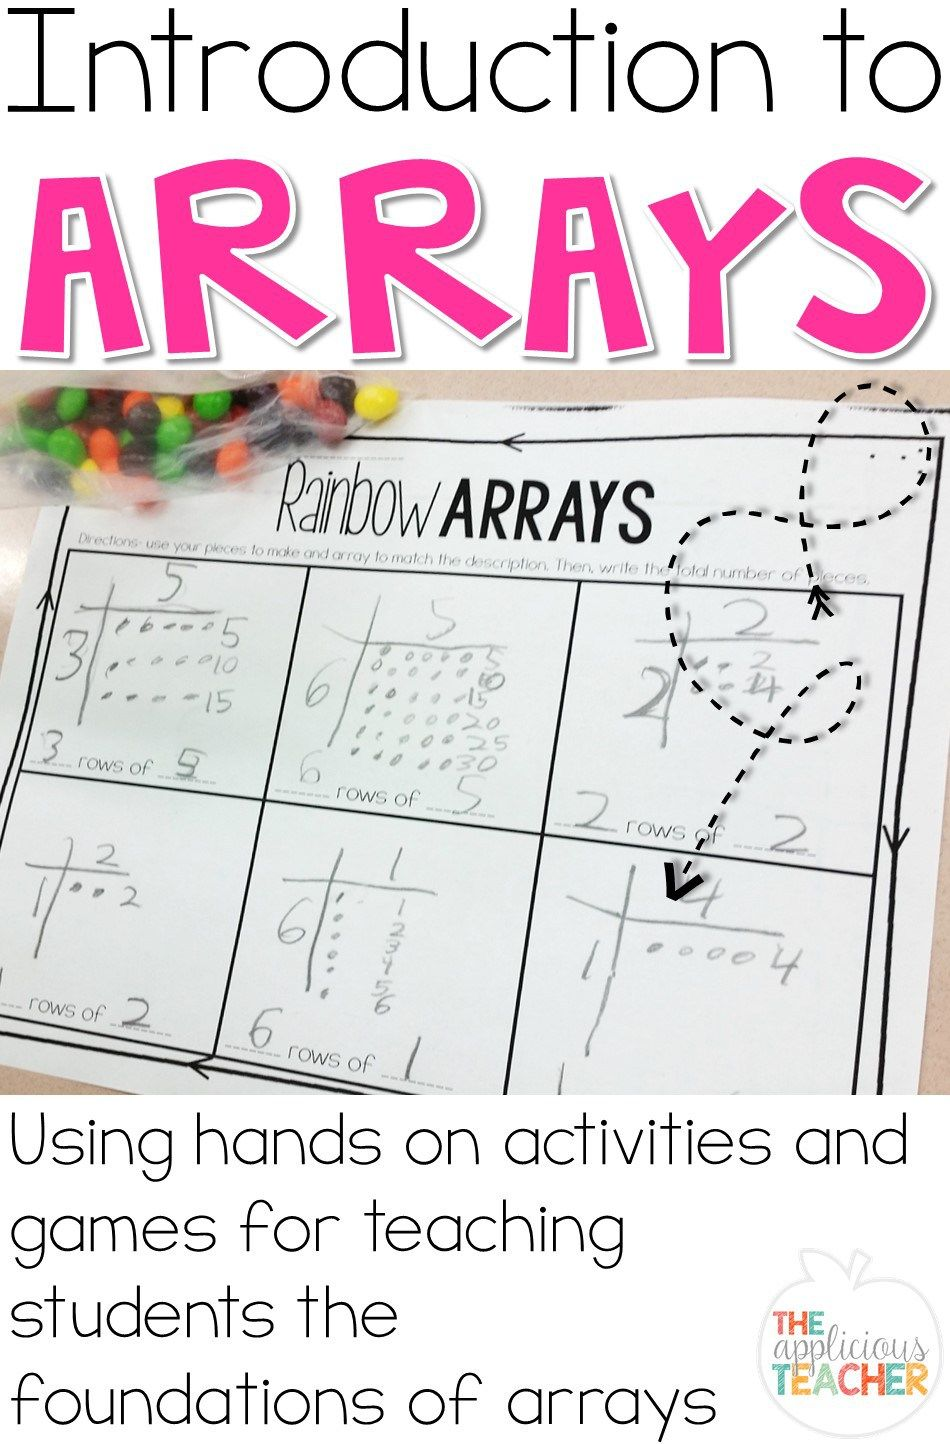 Rays of Arrays